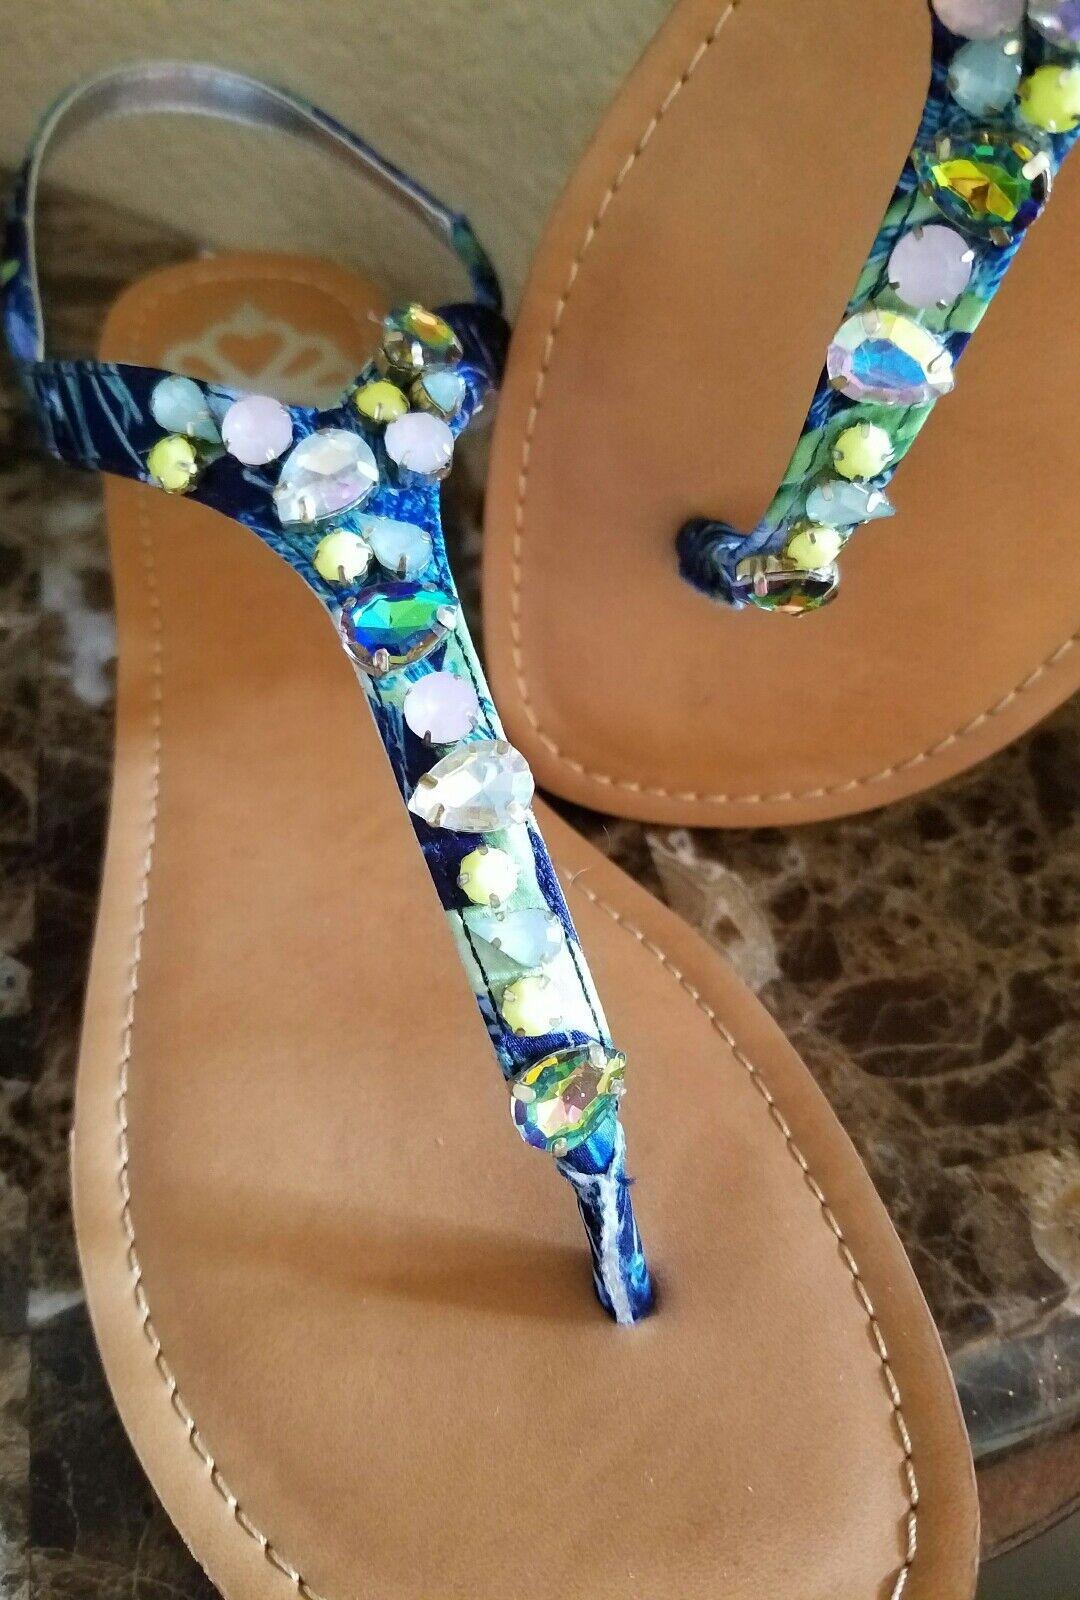 NEW FERGALICIOUS FERGIE blueE JEWELED JEWELED JEWELED WOMENS FLAT SANDALS  size 11 826f6a